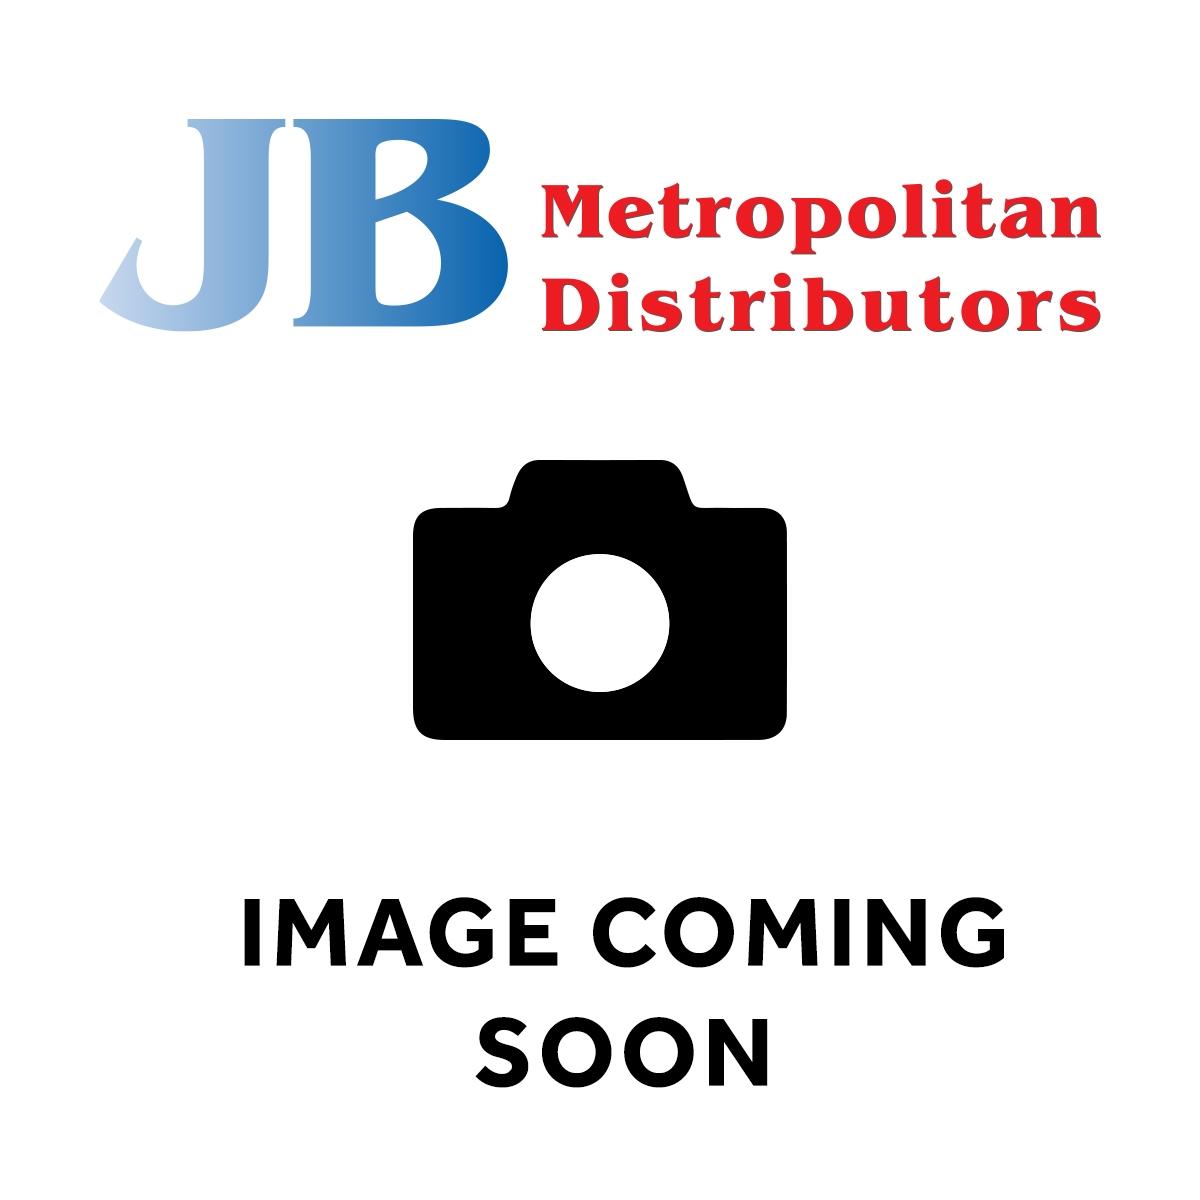 2L GOLDEN NORTH SIMPLY INDULGE CHOCOLATE ICE CREAM